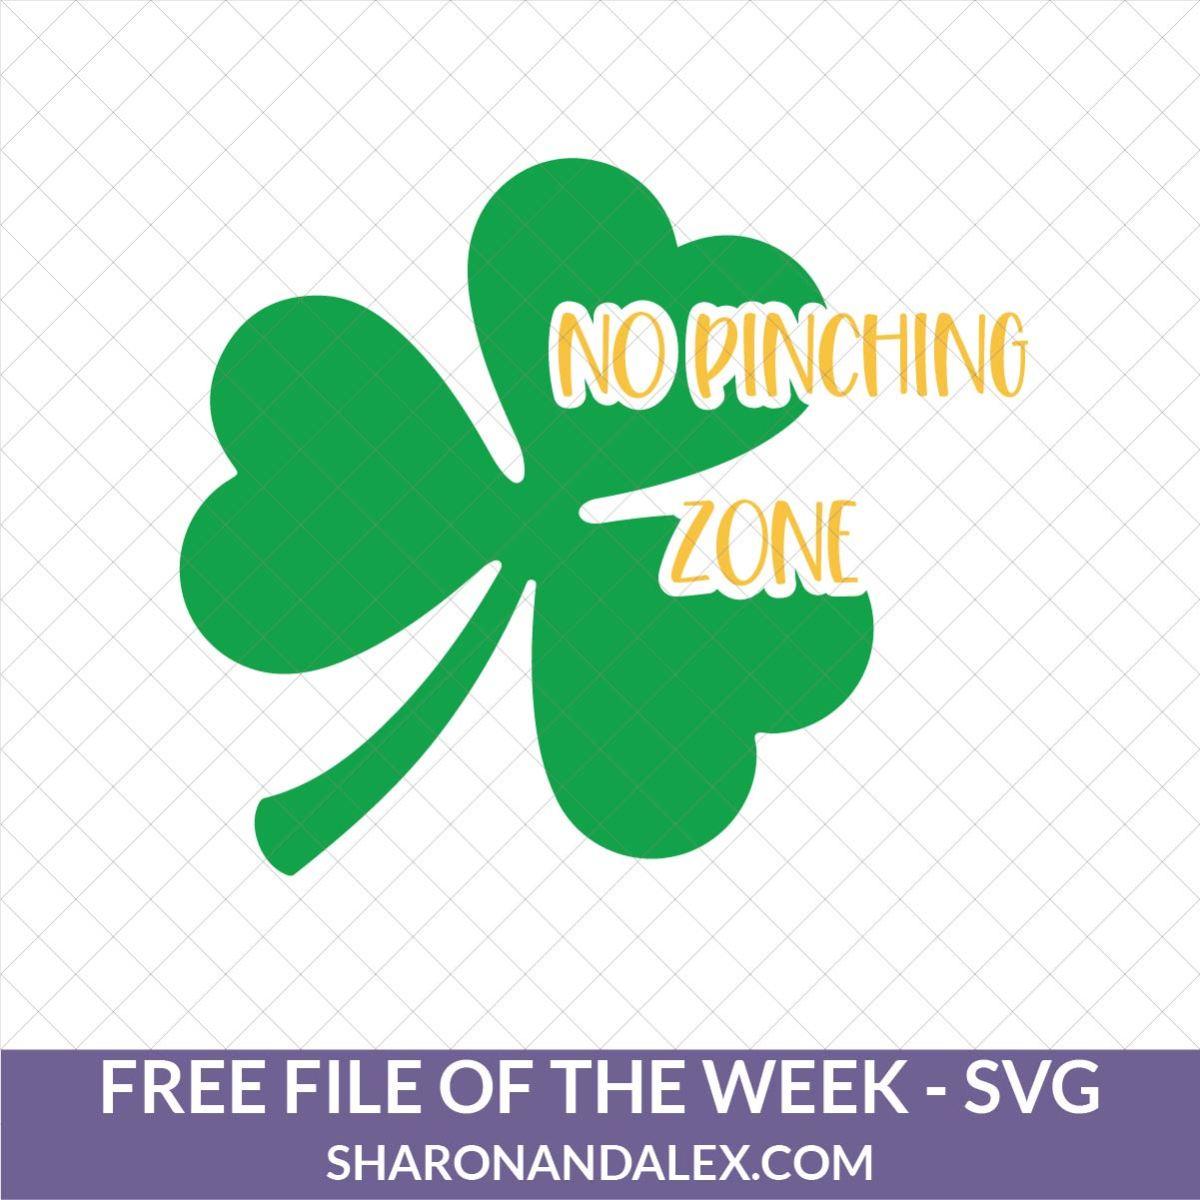 No Pinching Zone SVG File